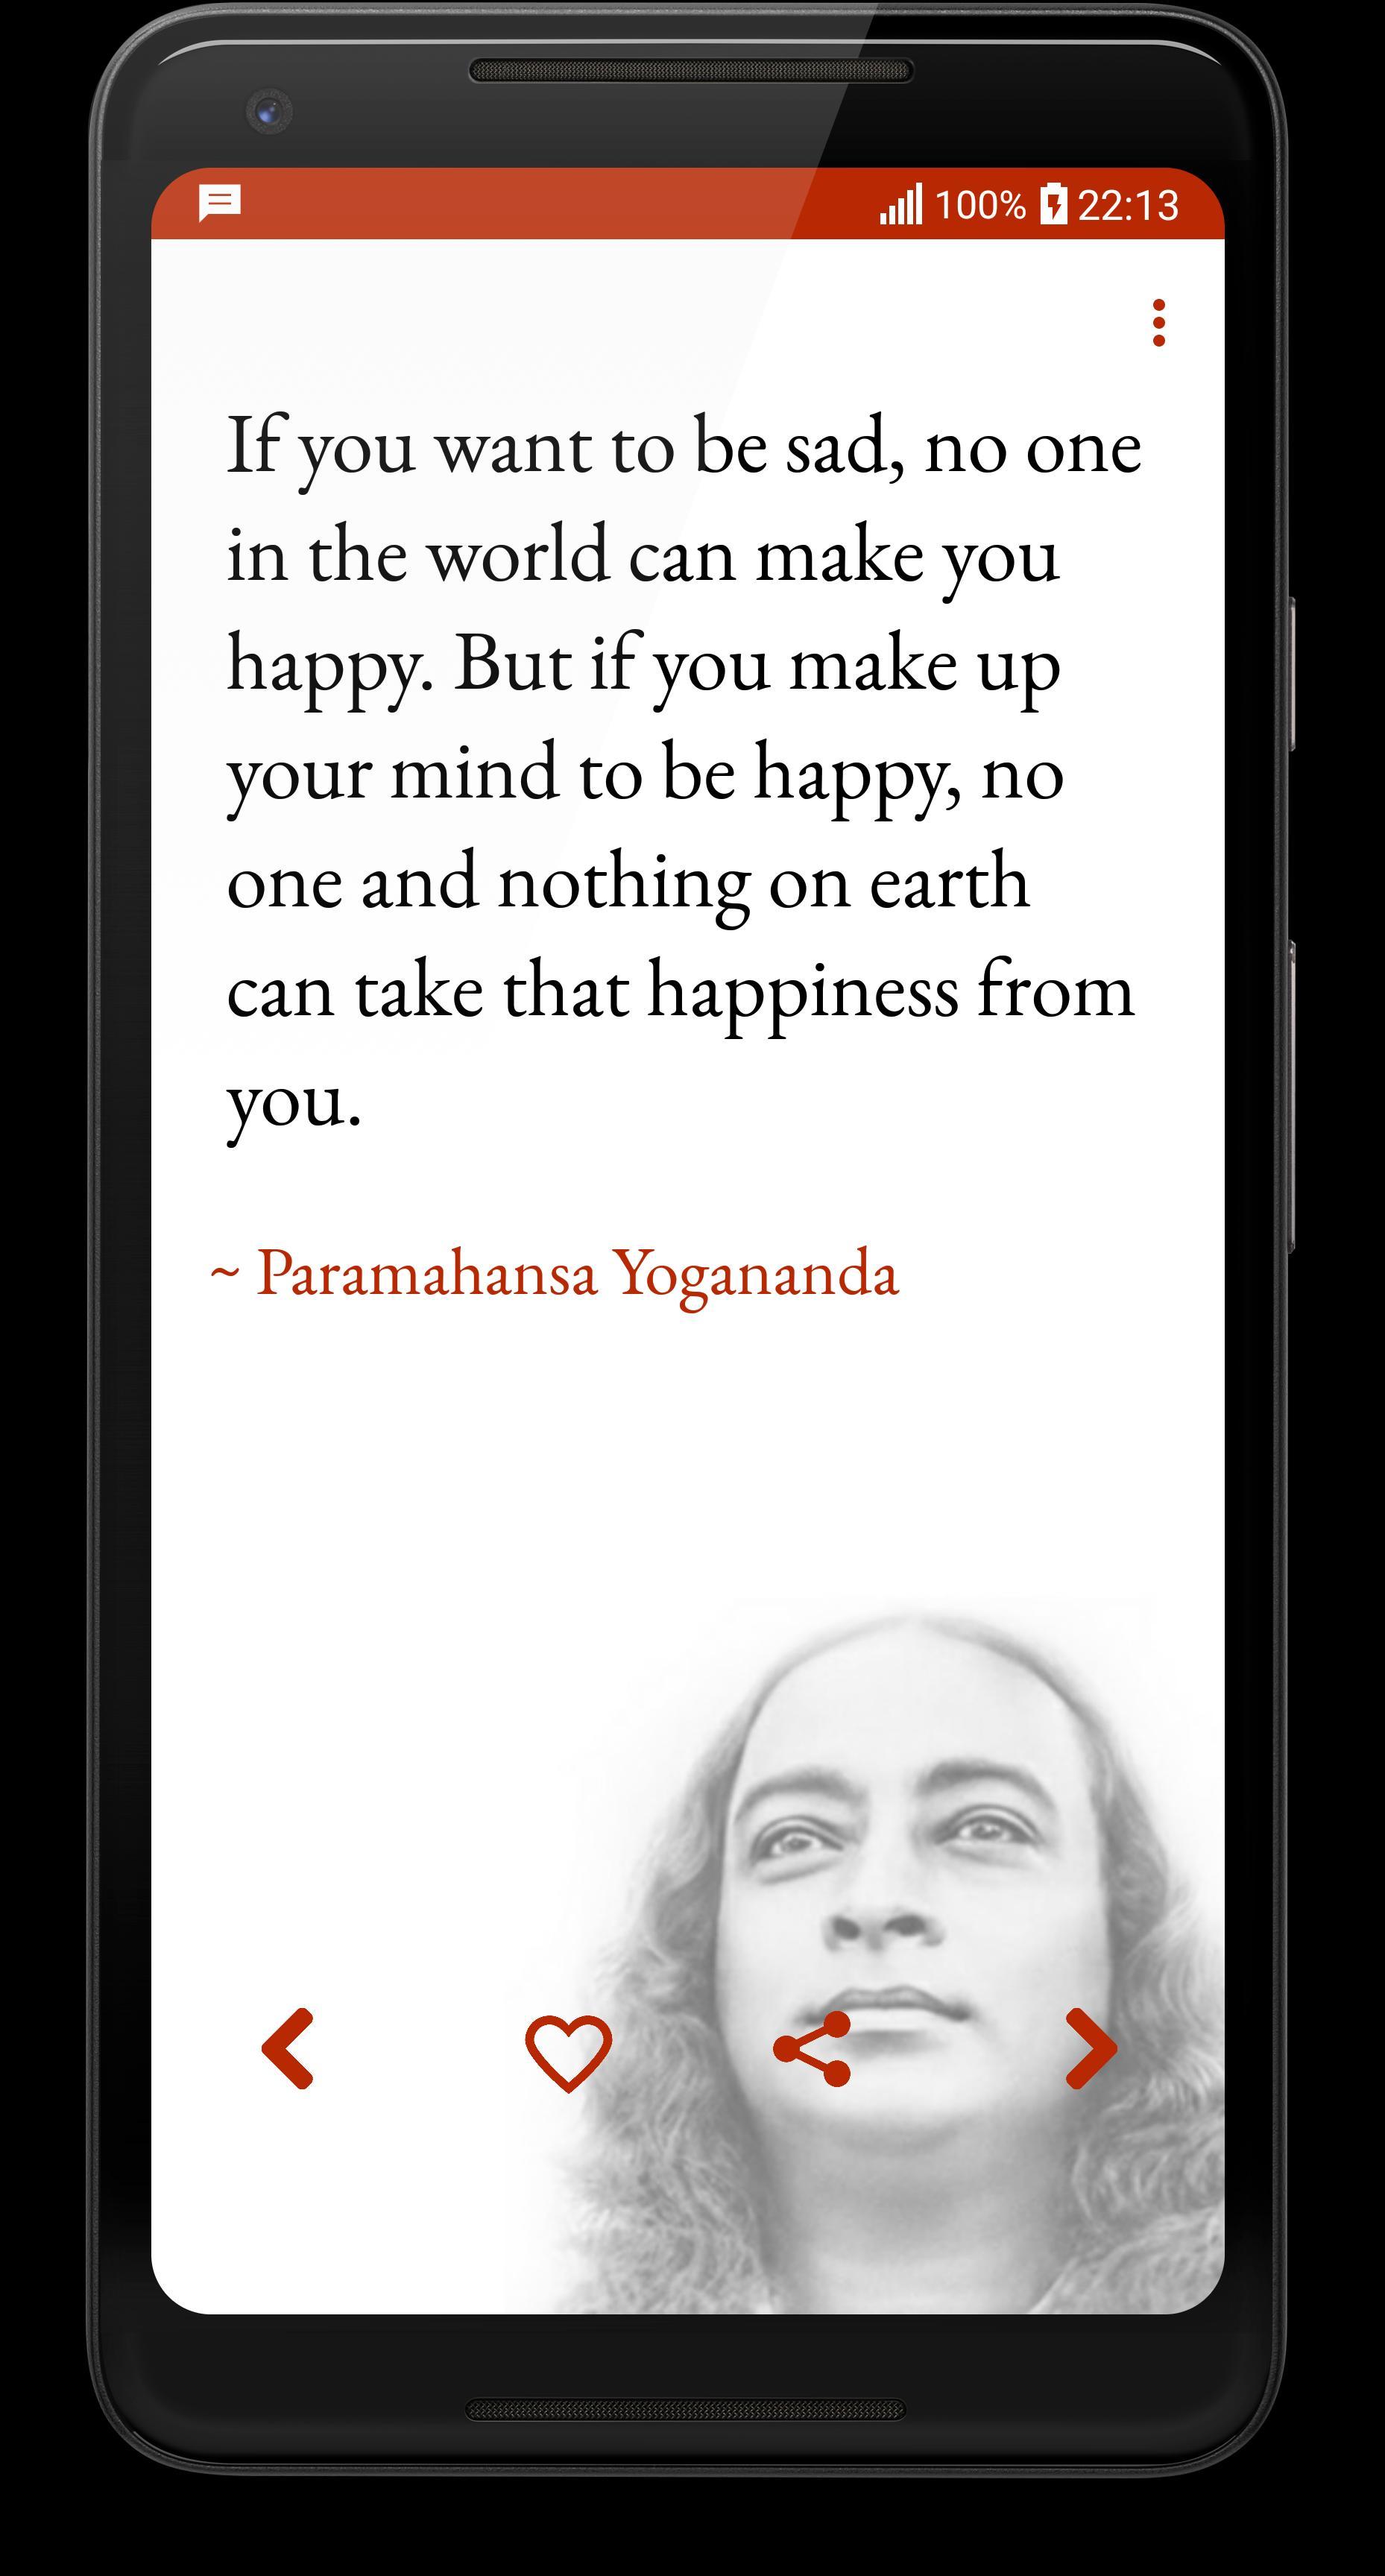 Autobiography Of A Yogi Paramahansa Yogananda For Android Apk Download